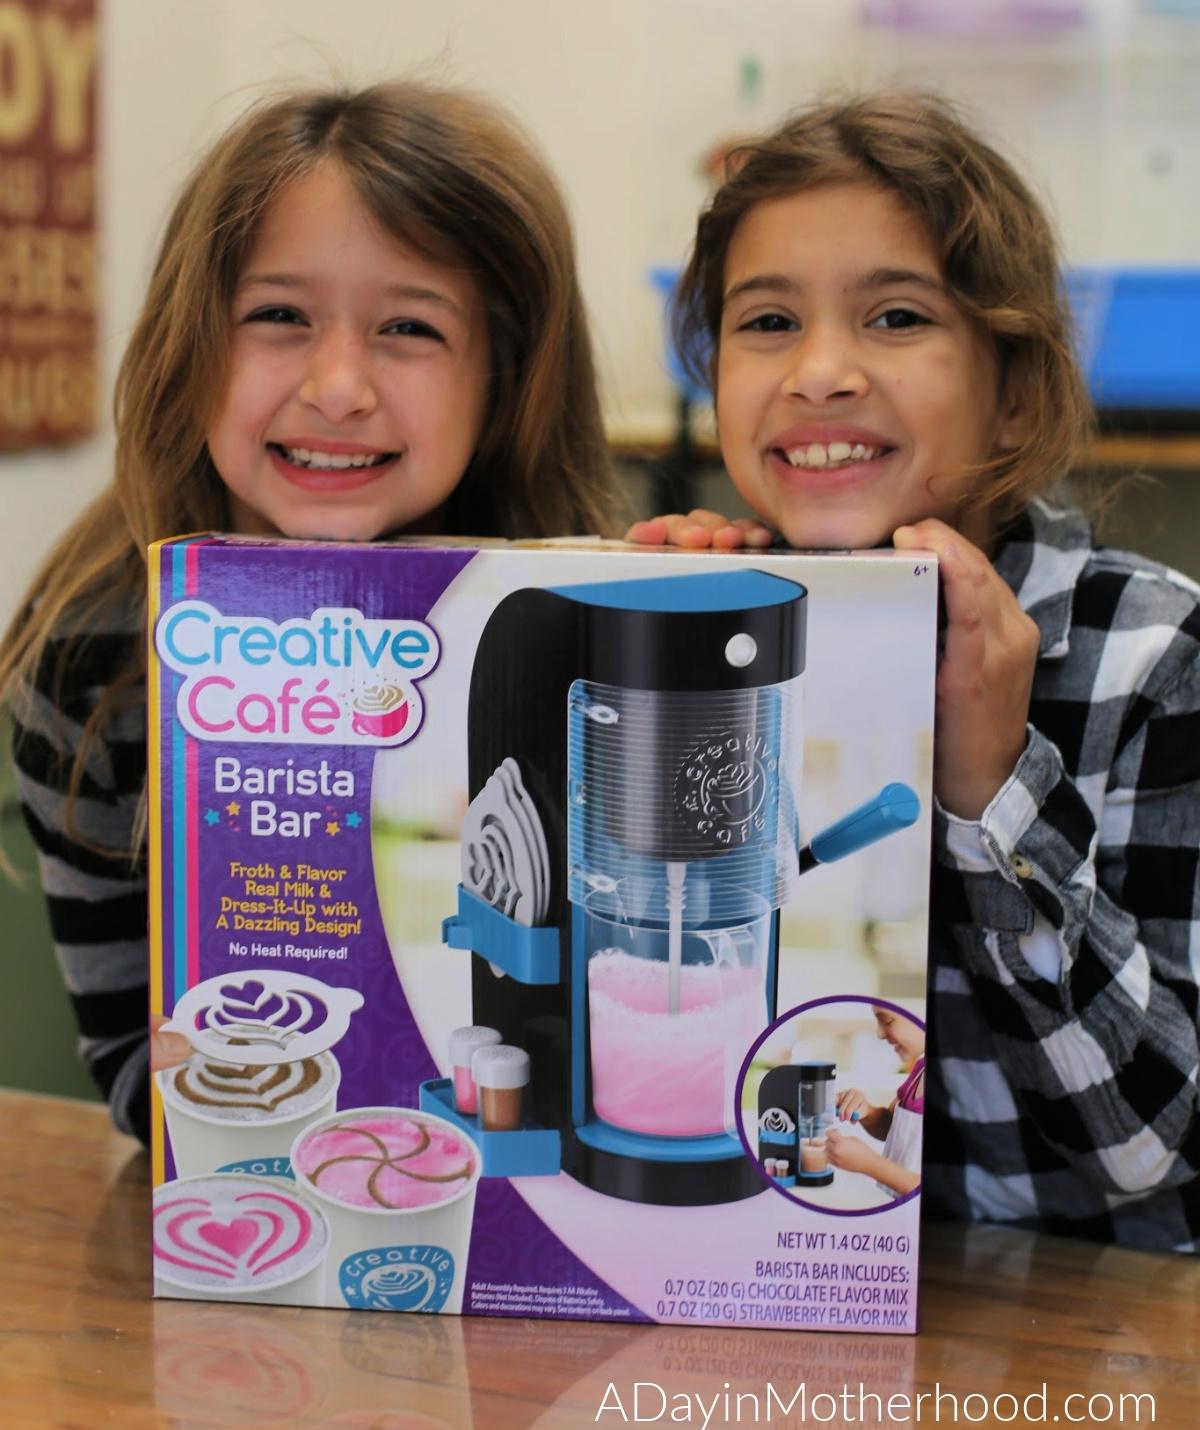 Let Kids Get Creative with the Creative Café Barista Bar